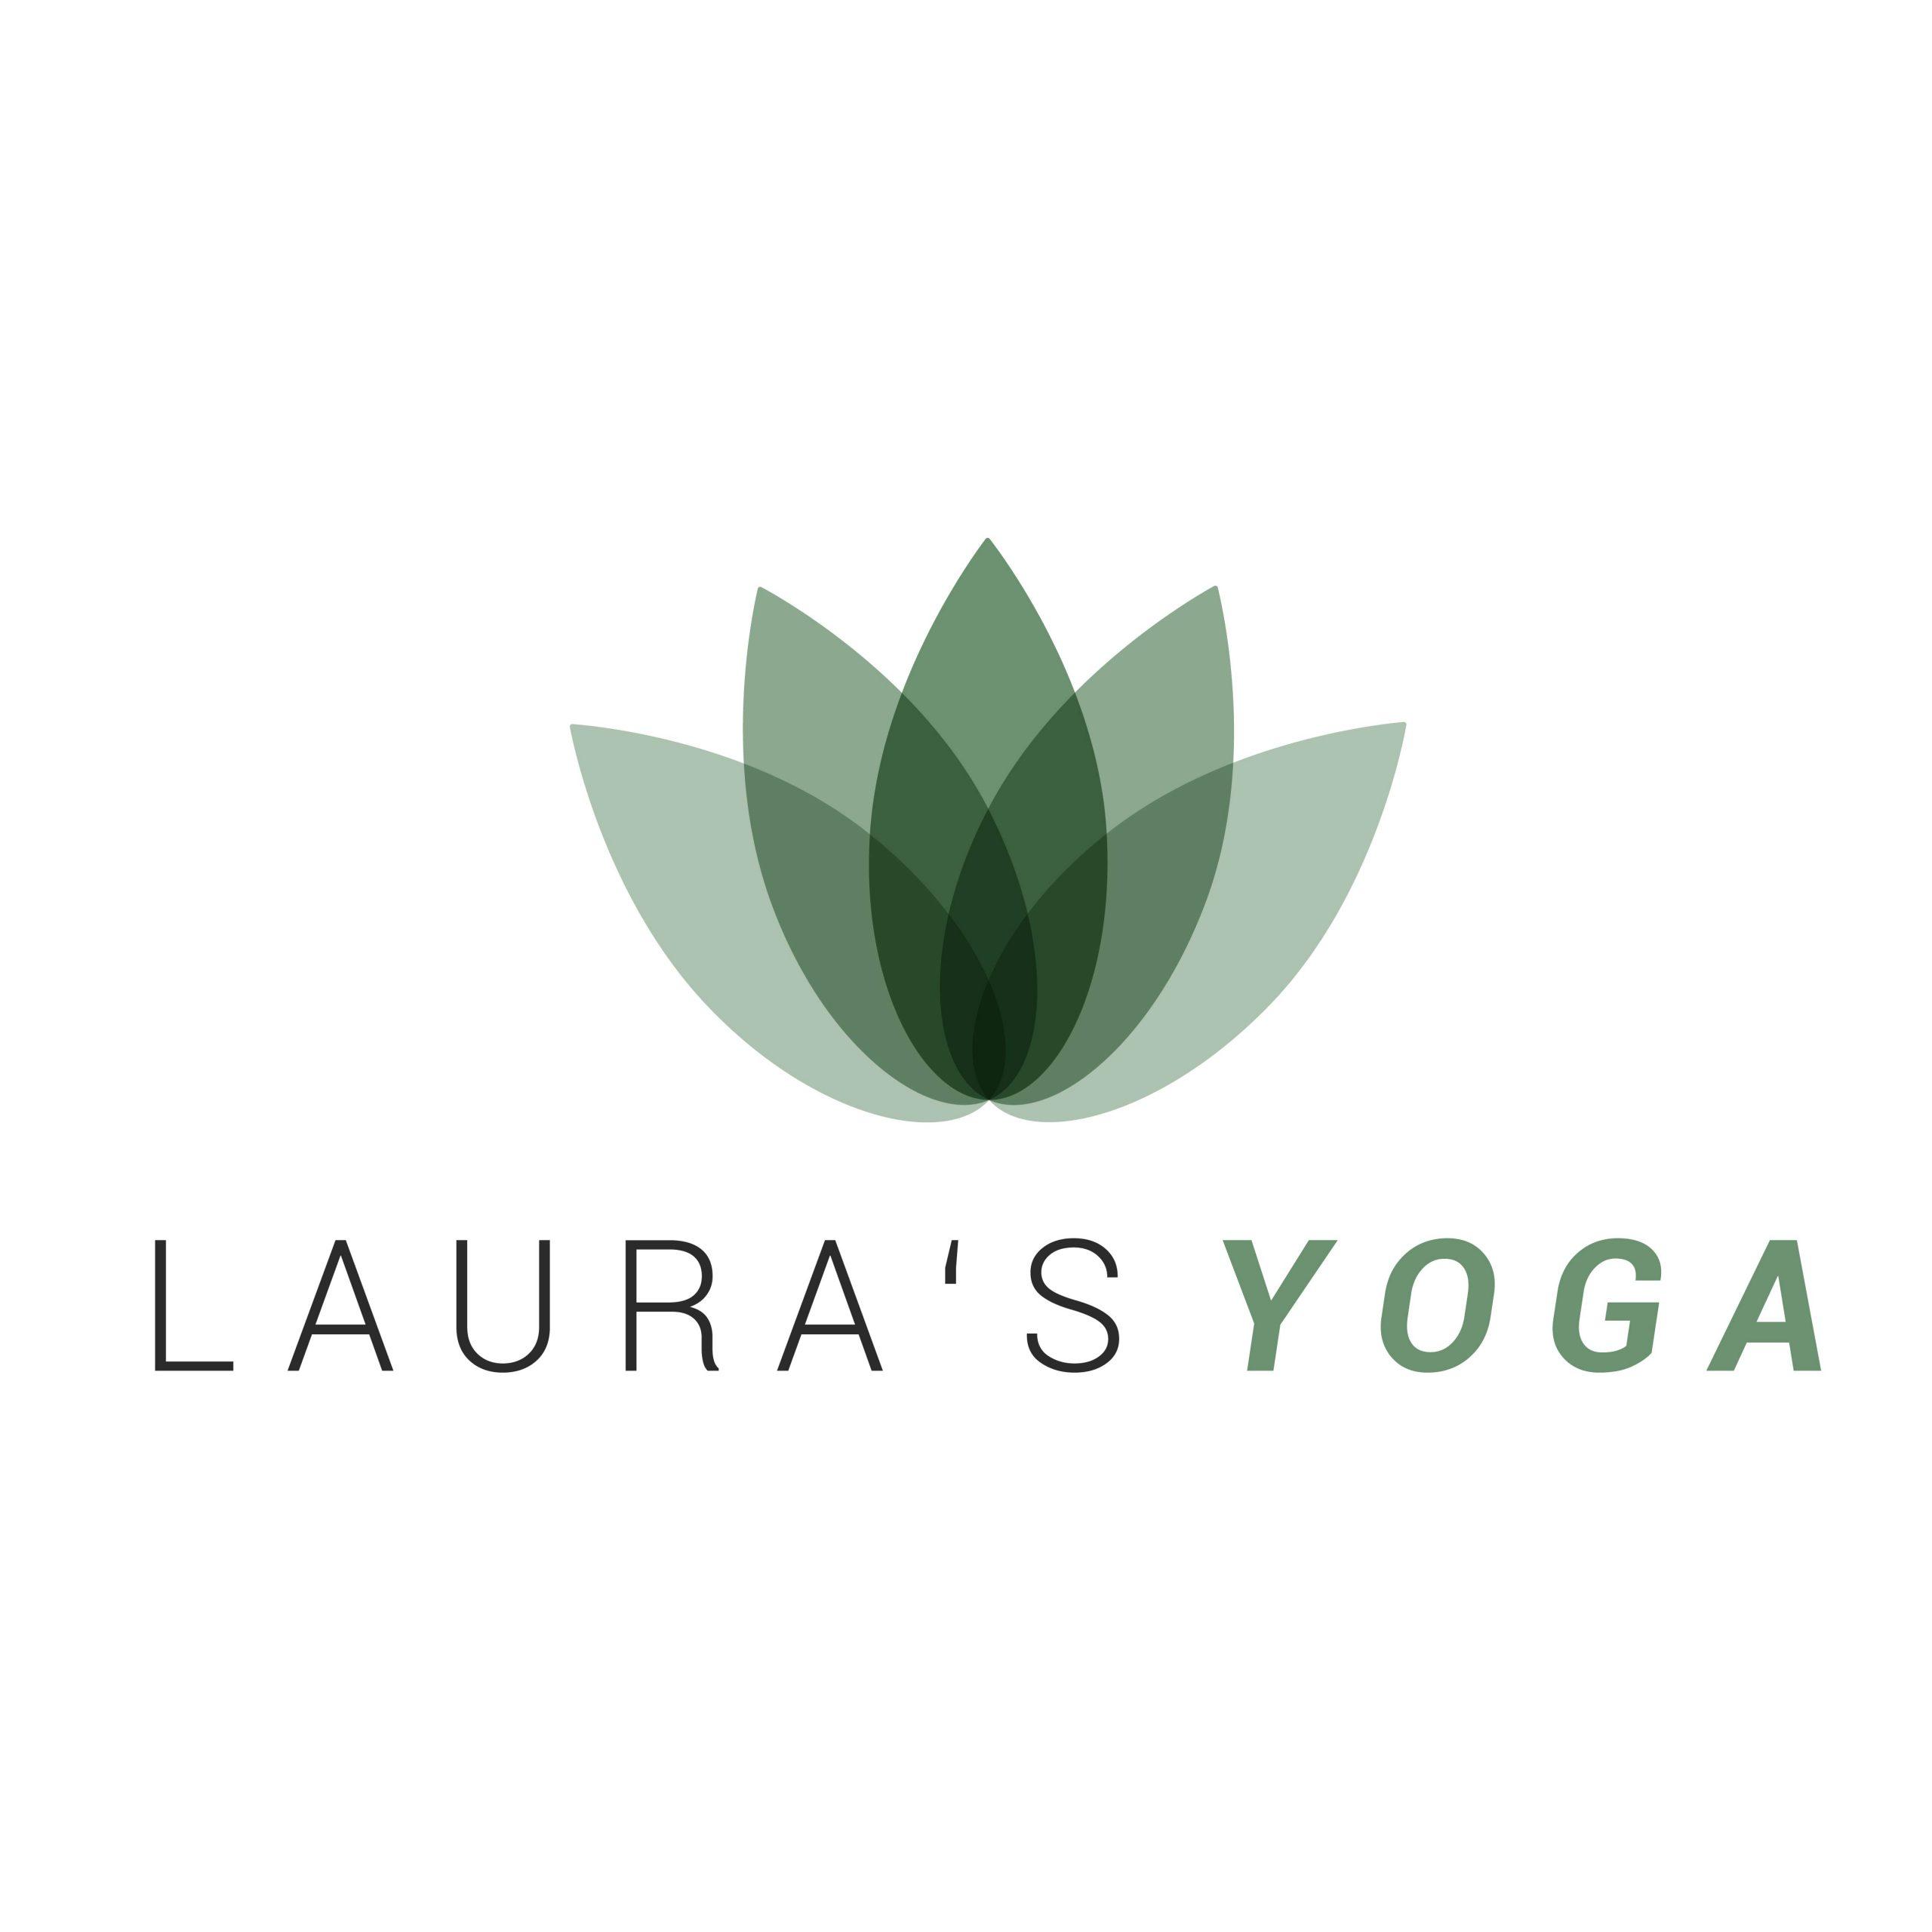 Laura's yoga